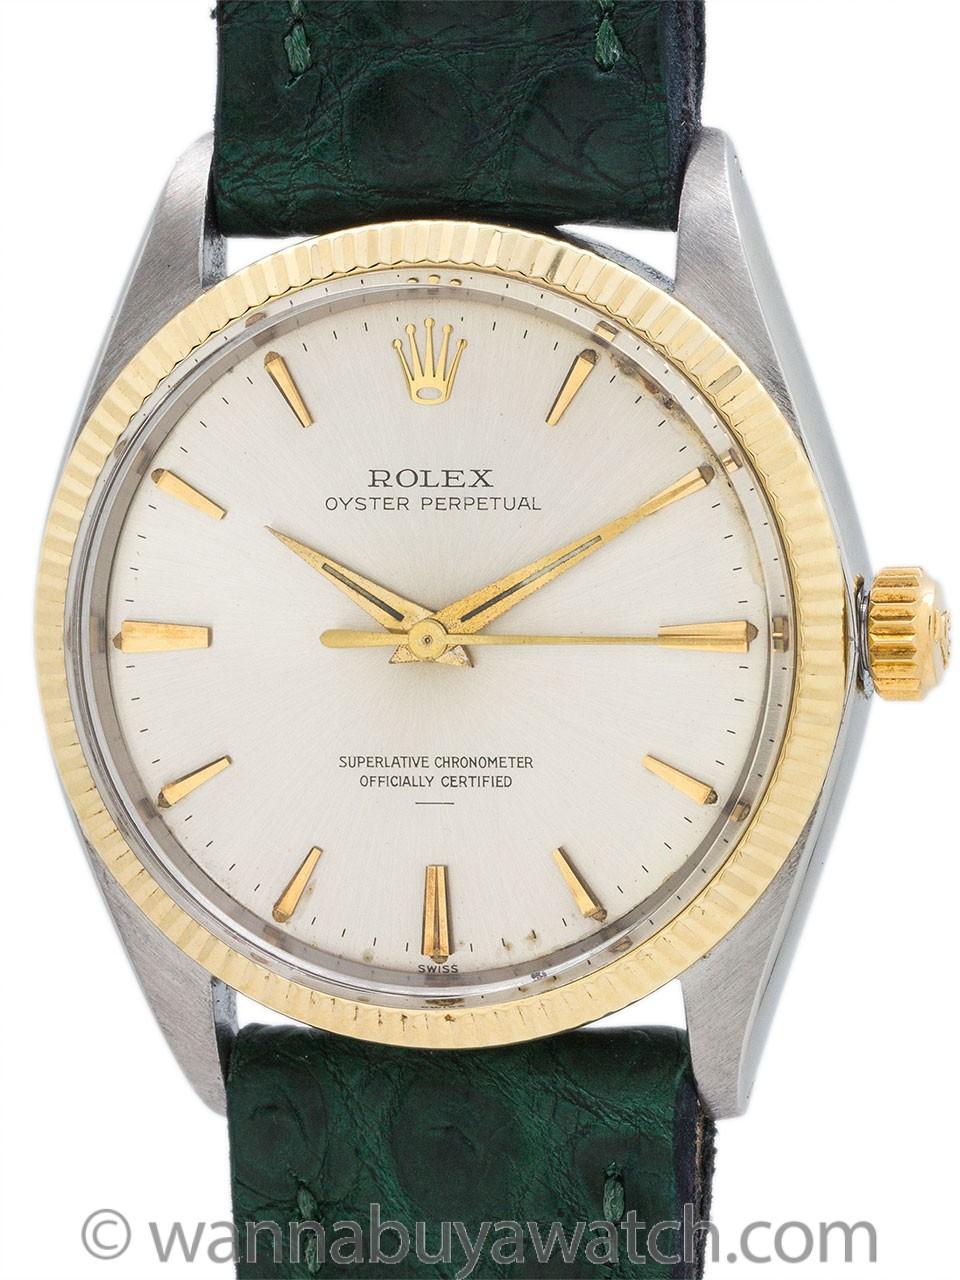 Rolex Oyster Perpetual SS/14K YG ref 1005 circa 1964